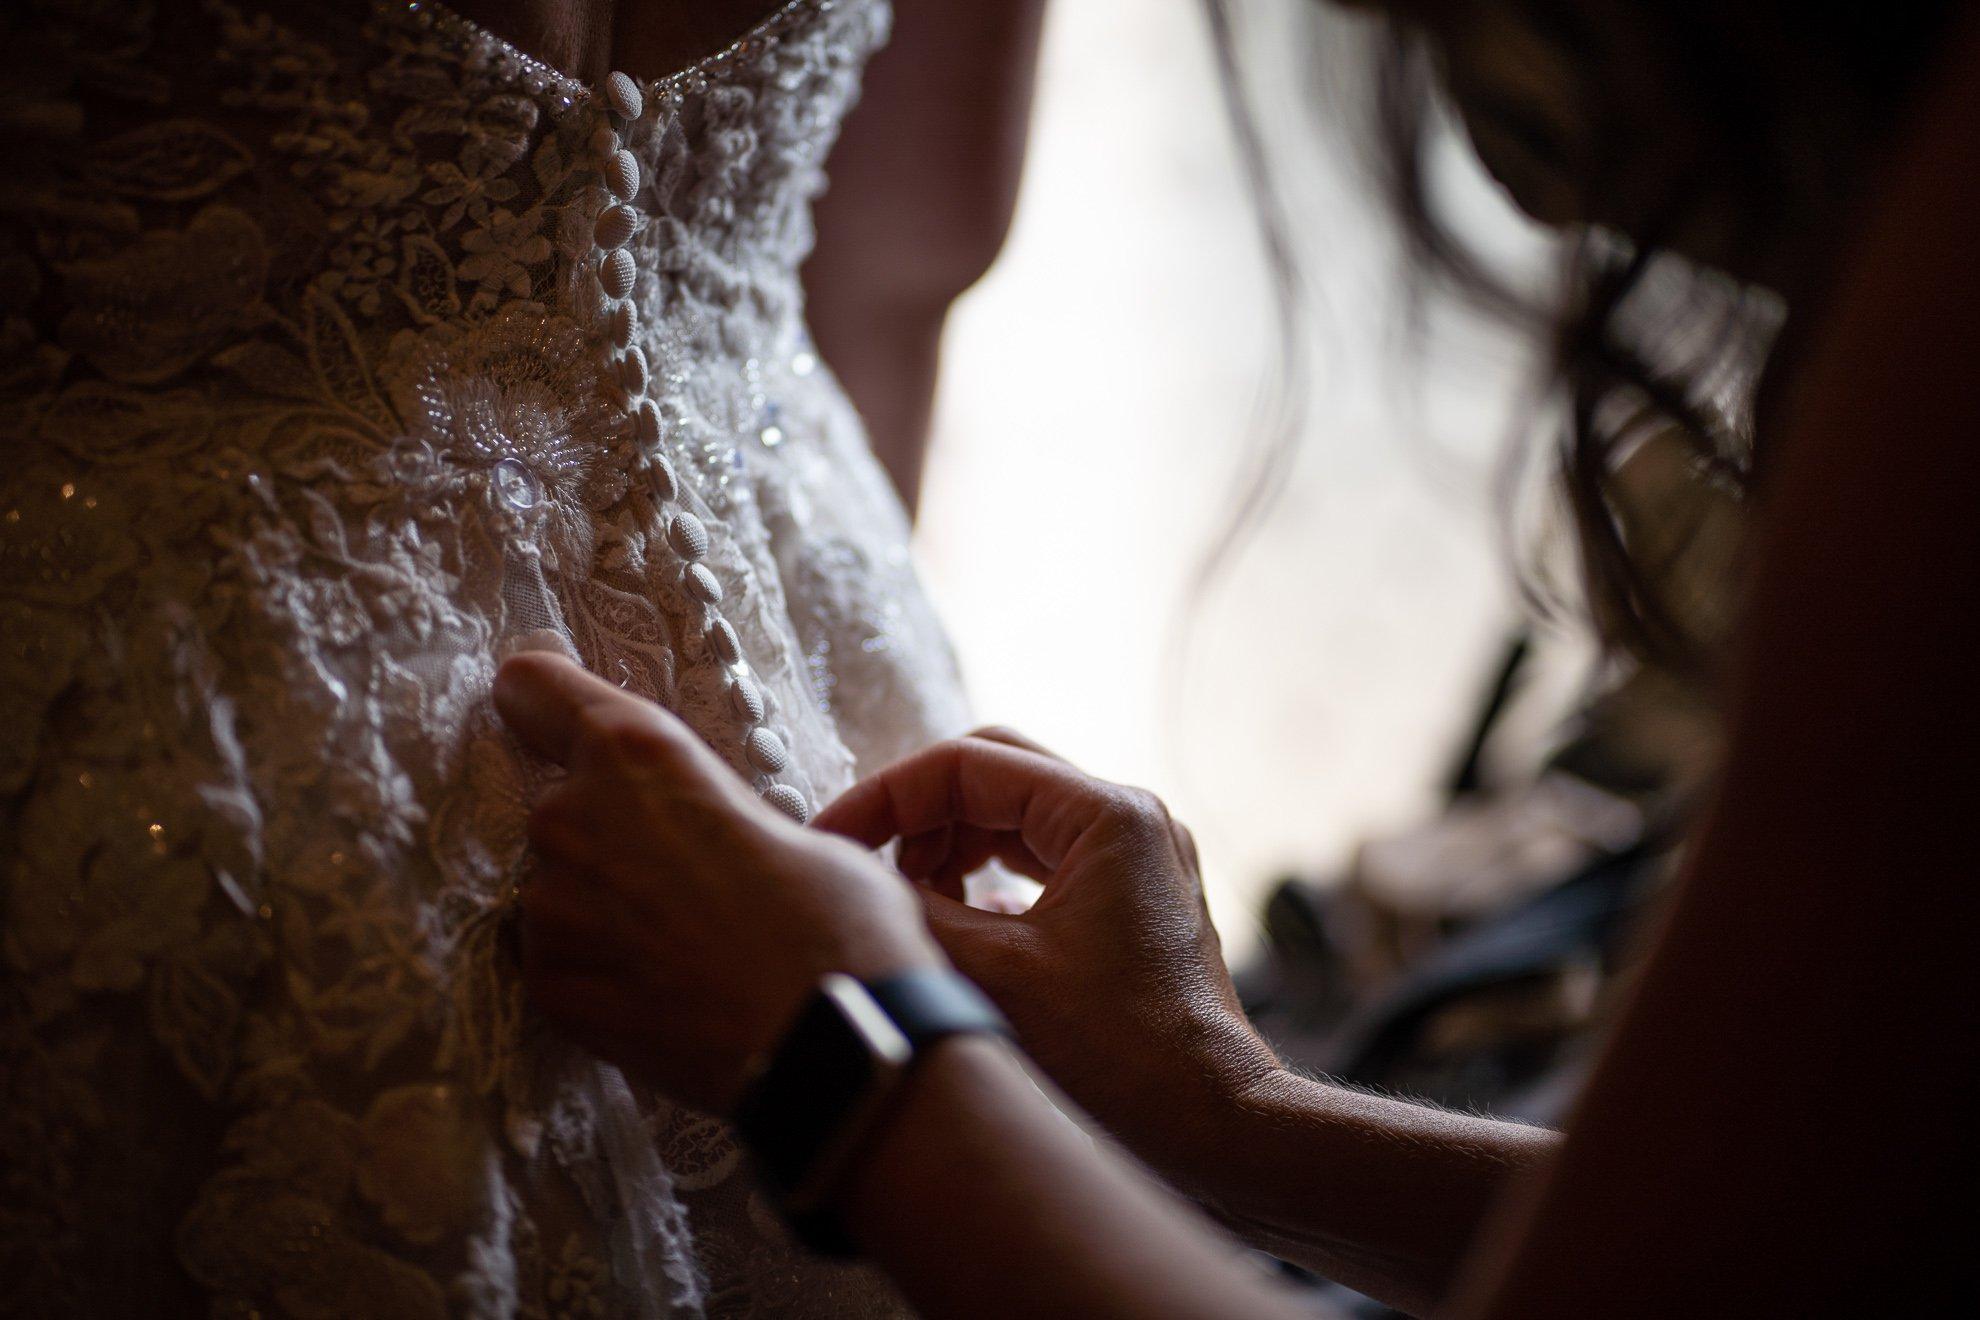 bridesmaid bottoning wedding dress